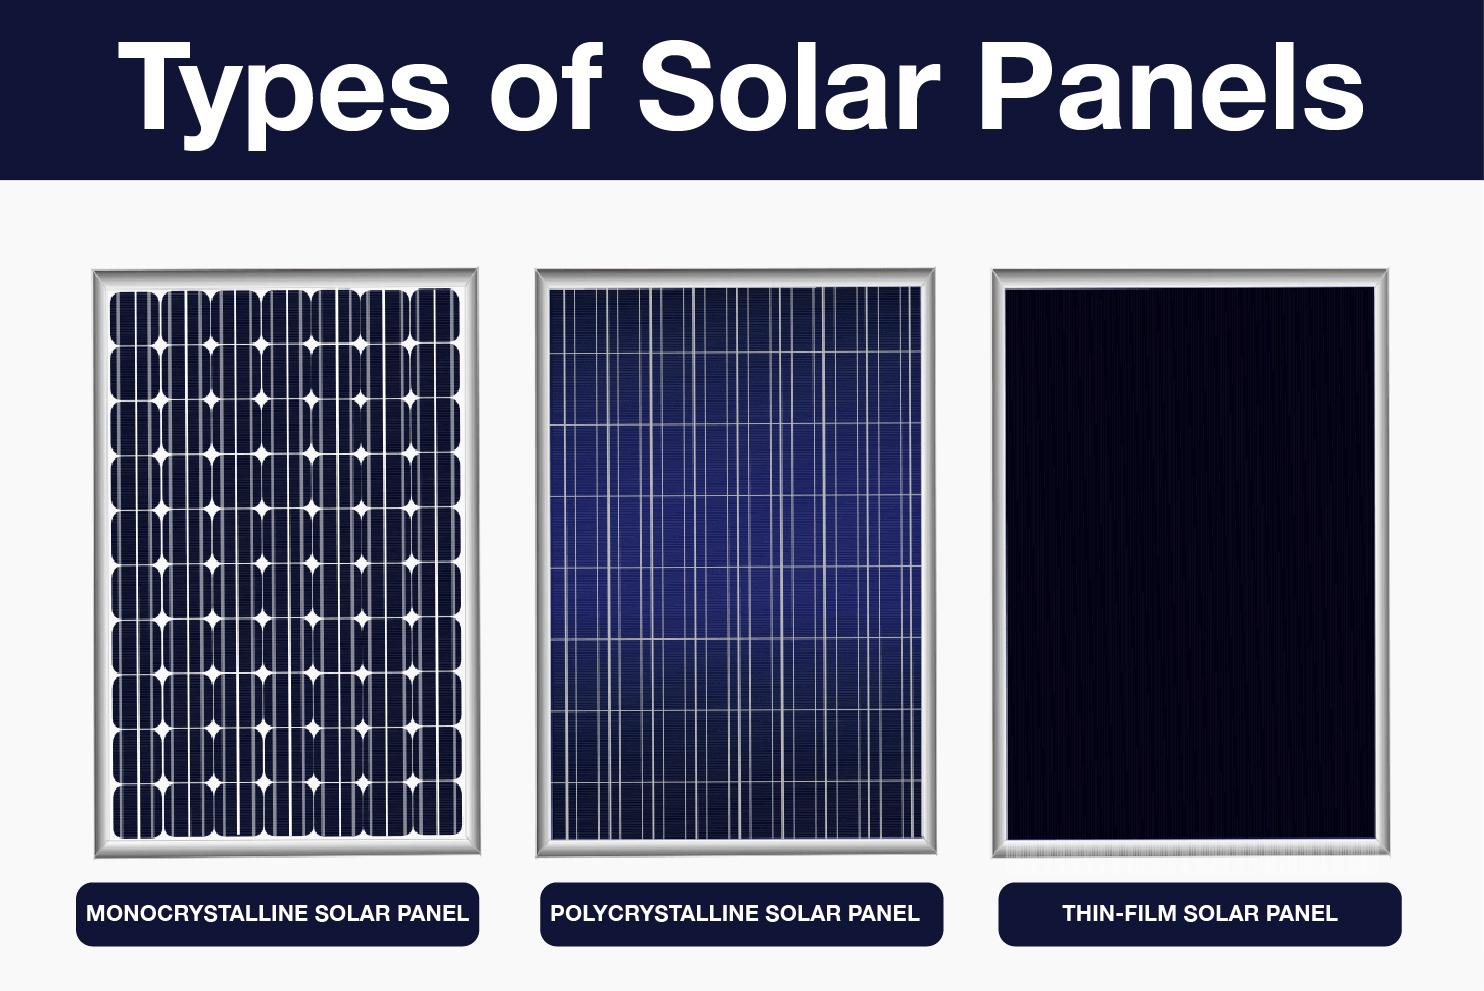 Types of solar panels